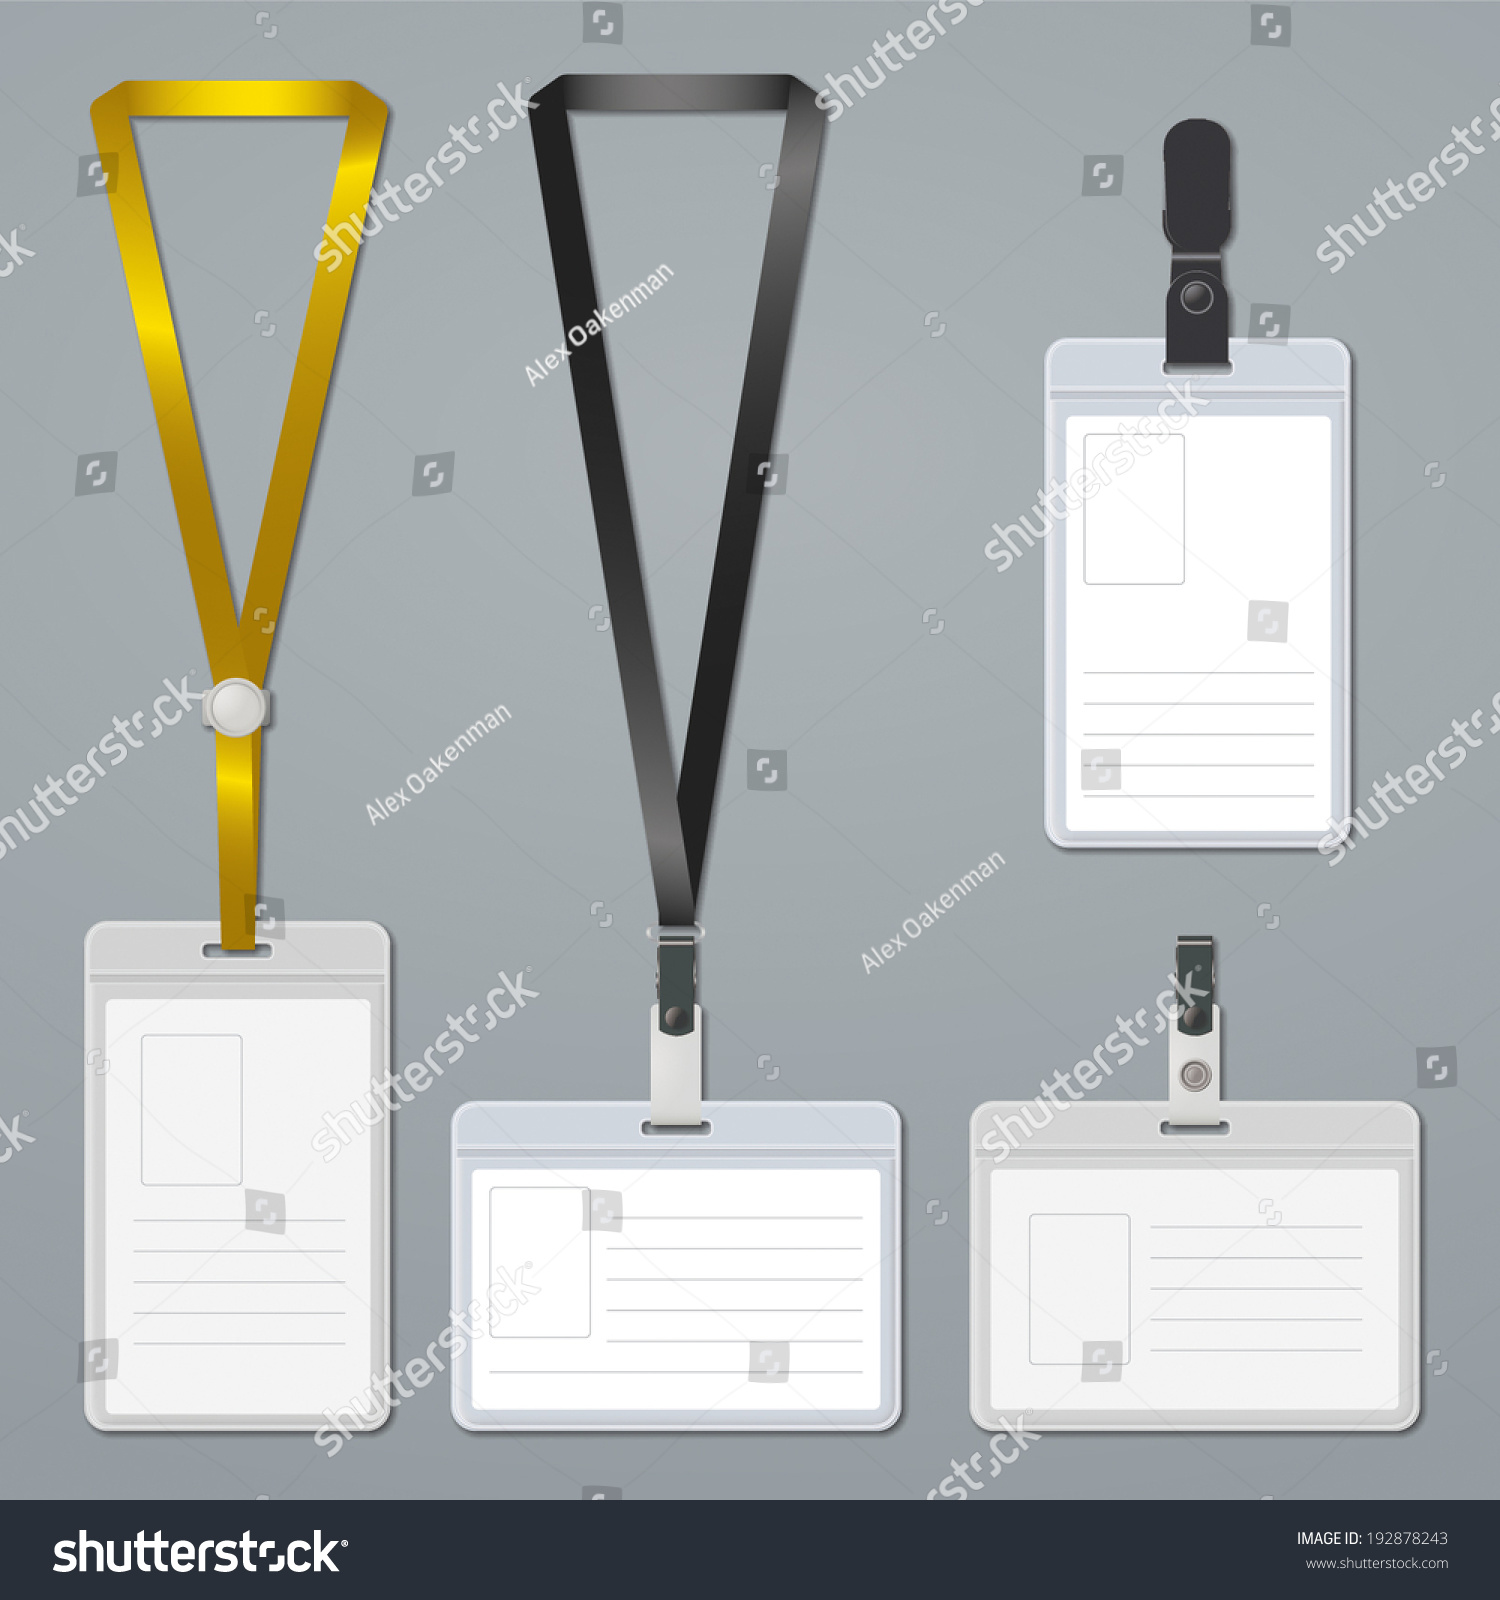 Royalty-free Badge, clip and lanyard templates. #192878243 Stock ...